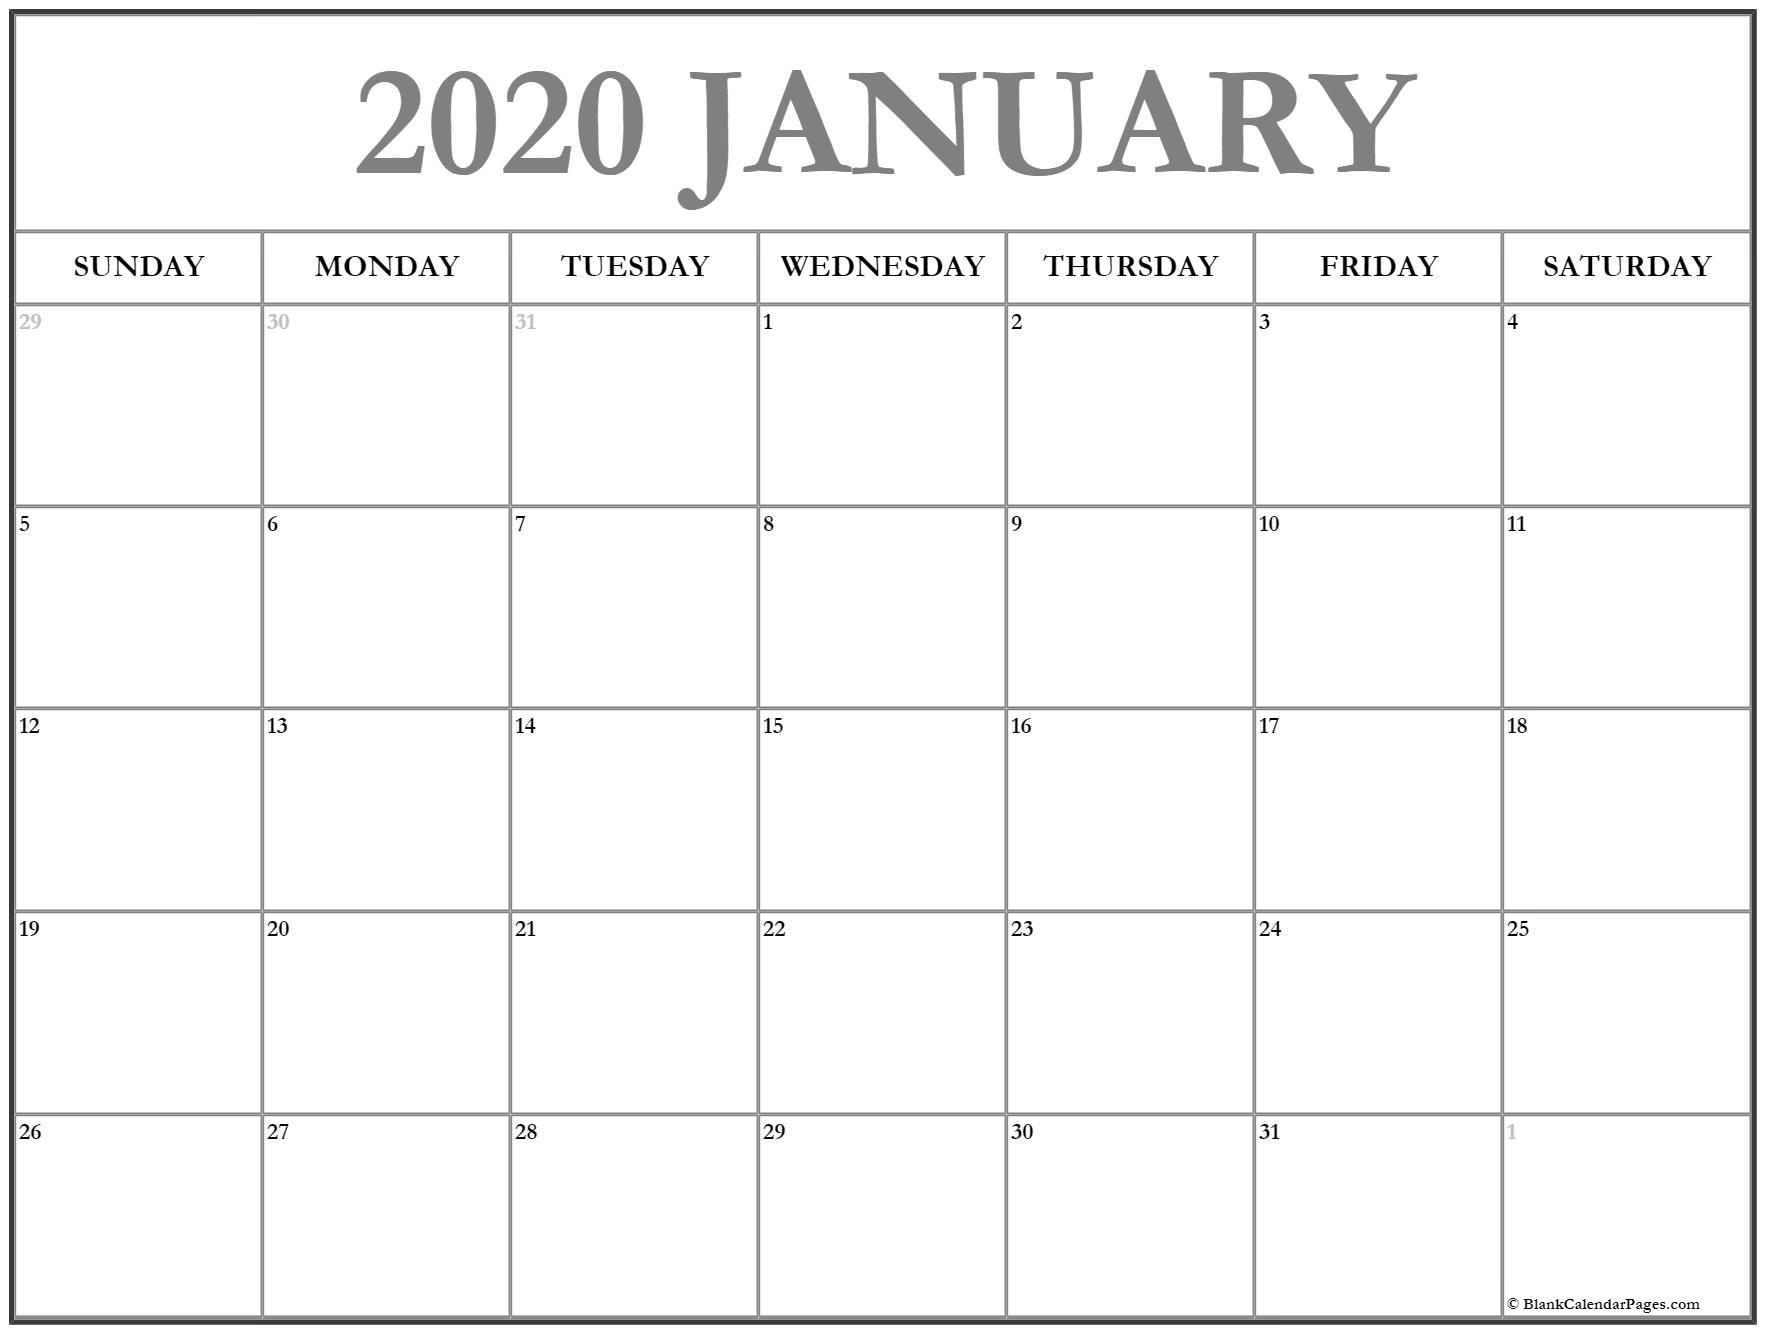 2020 Monthly Calendar Free Printable January 2020 Calendar